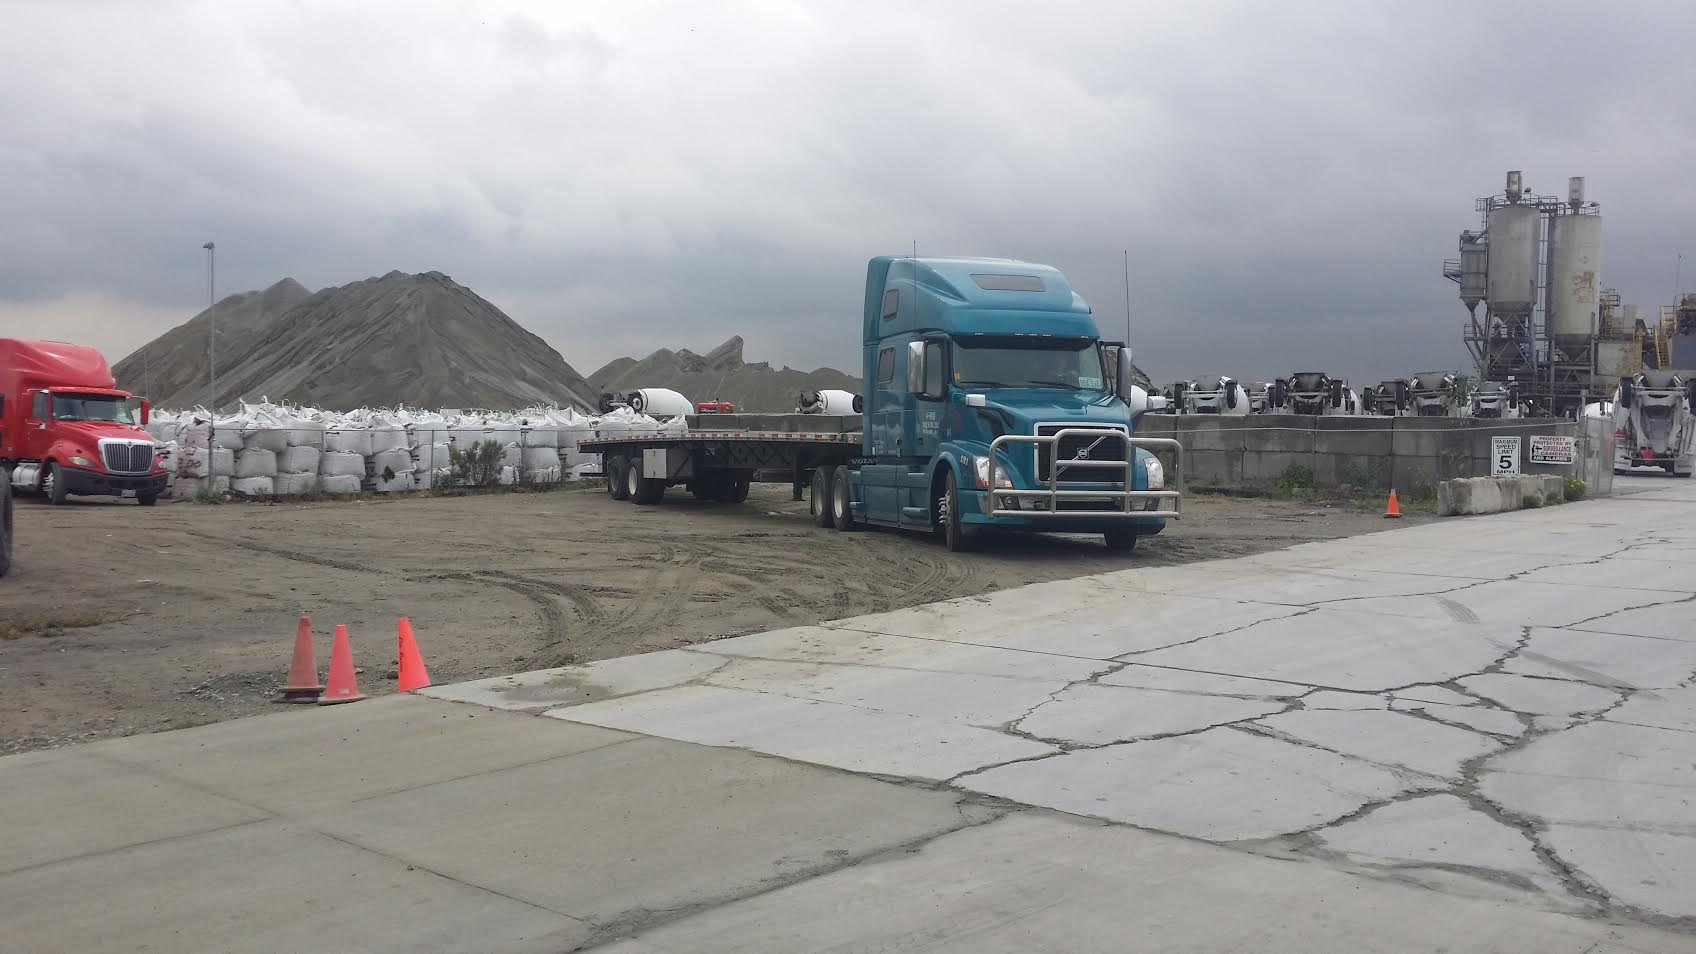 Dallas River Rock San Antonio Houston Beach Pebble Truckloads